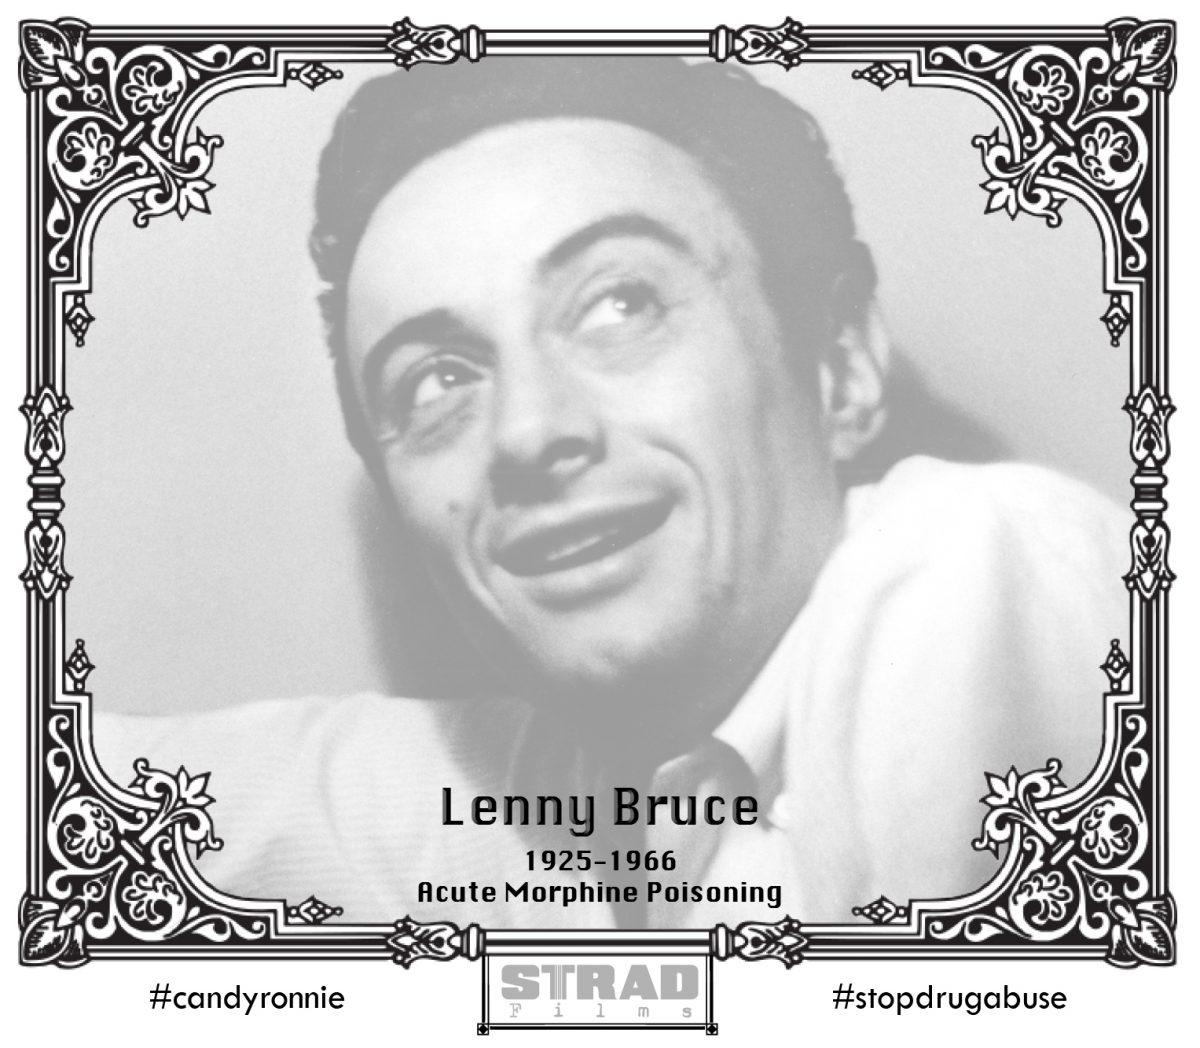 Comedian Lenny Bruce